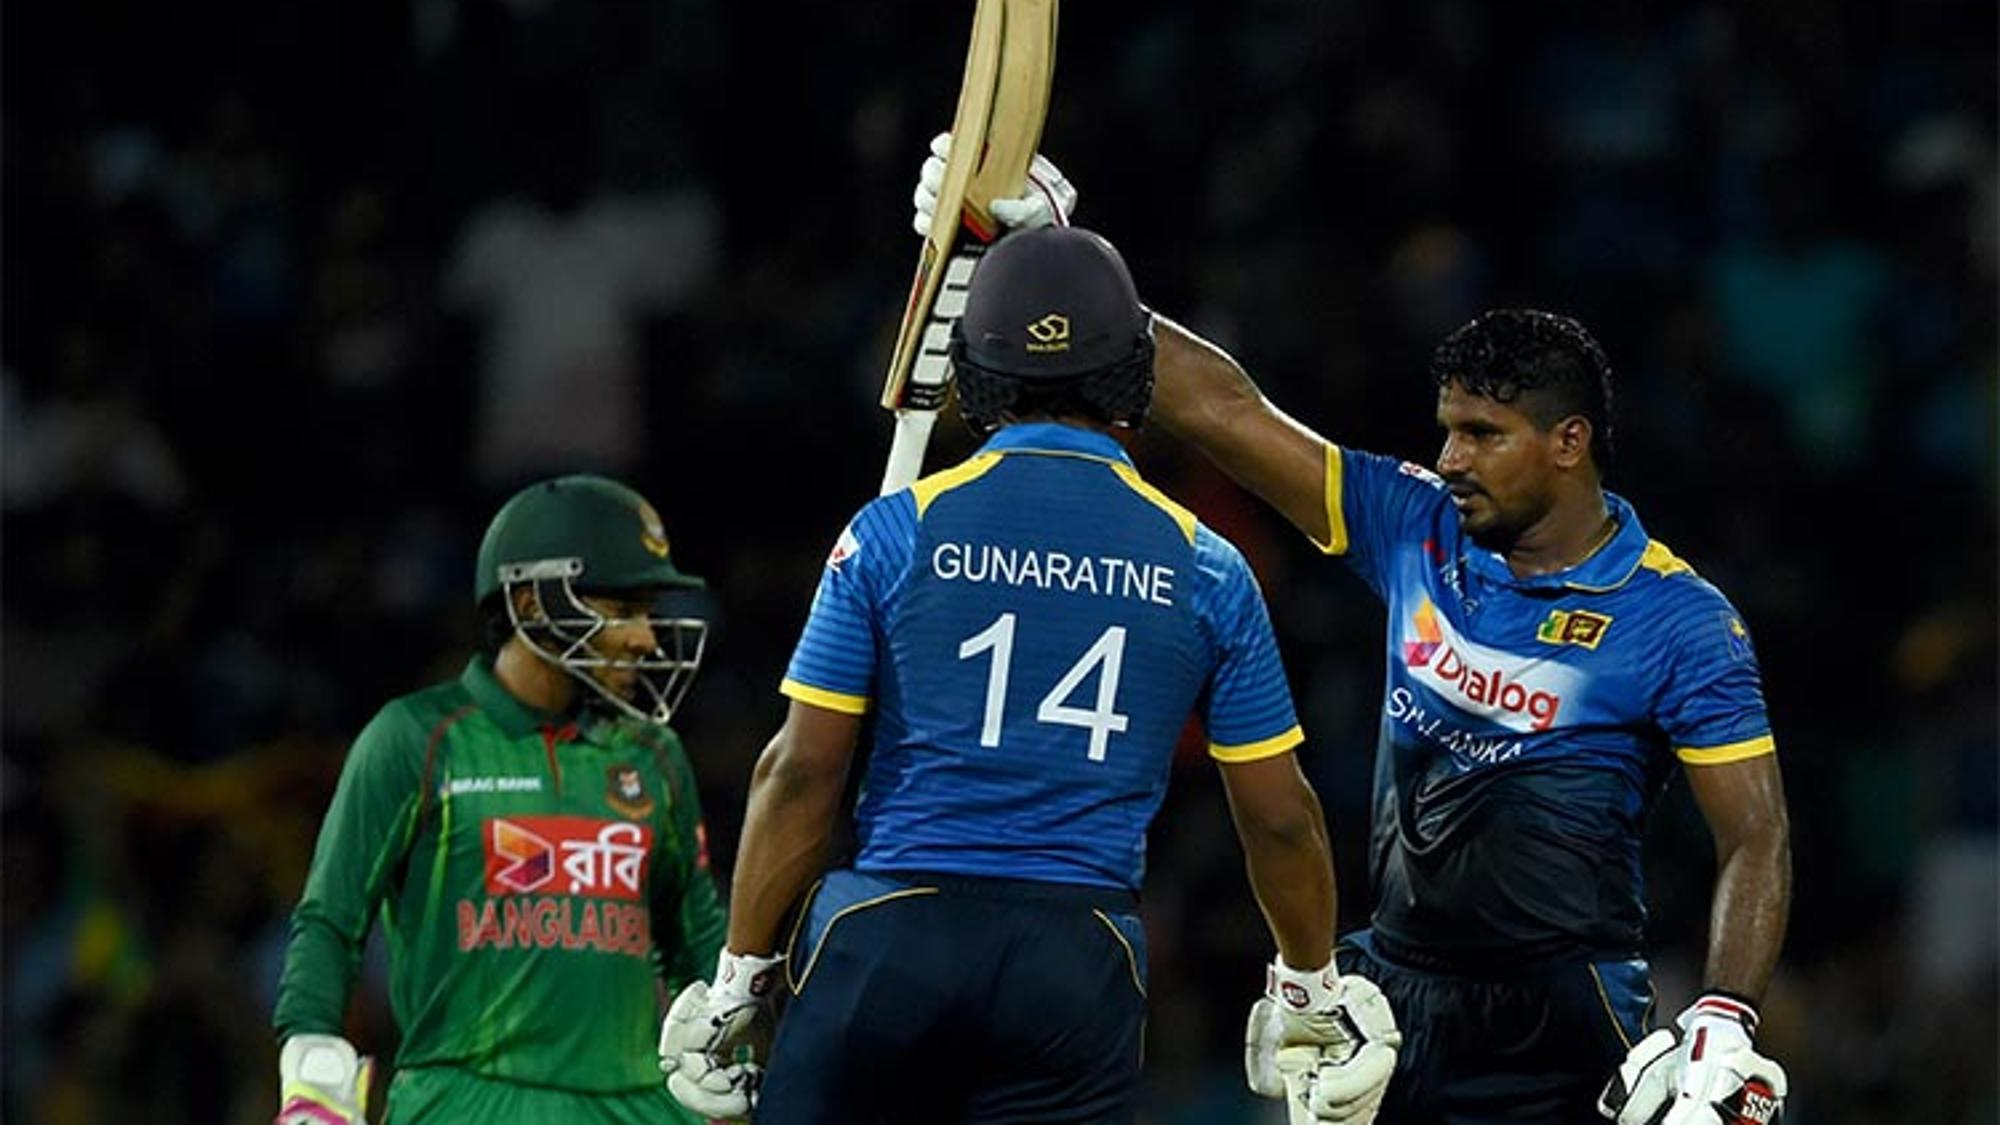 Kusal_Perera_made_a_quickfire_77_off_53_balls_to_help_Sri_Lanka_win_the_first_T20I